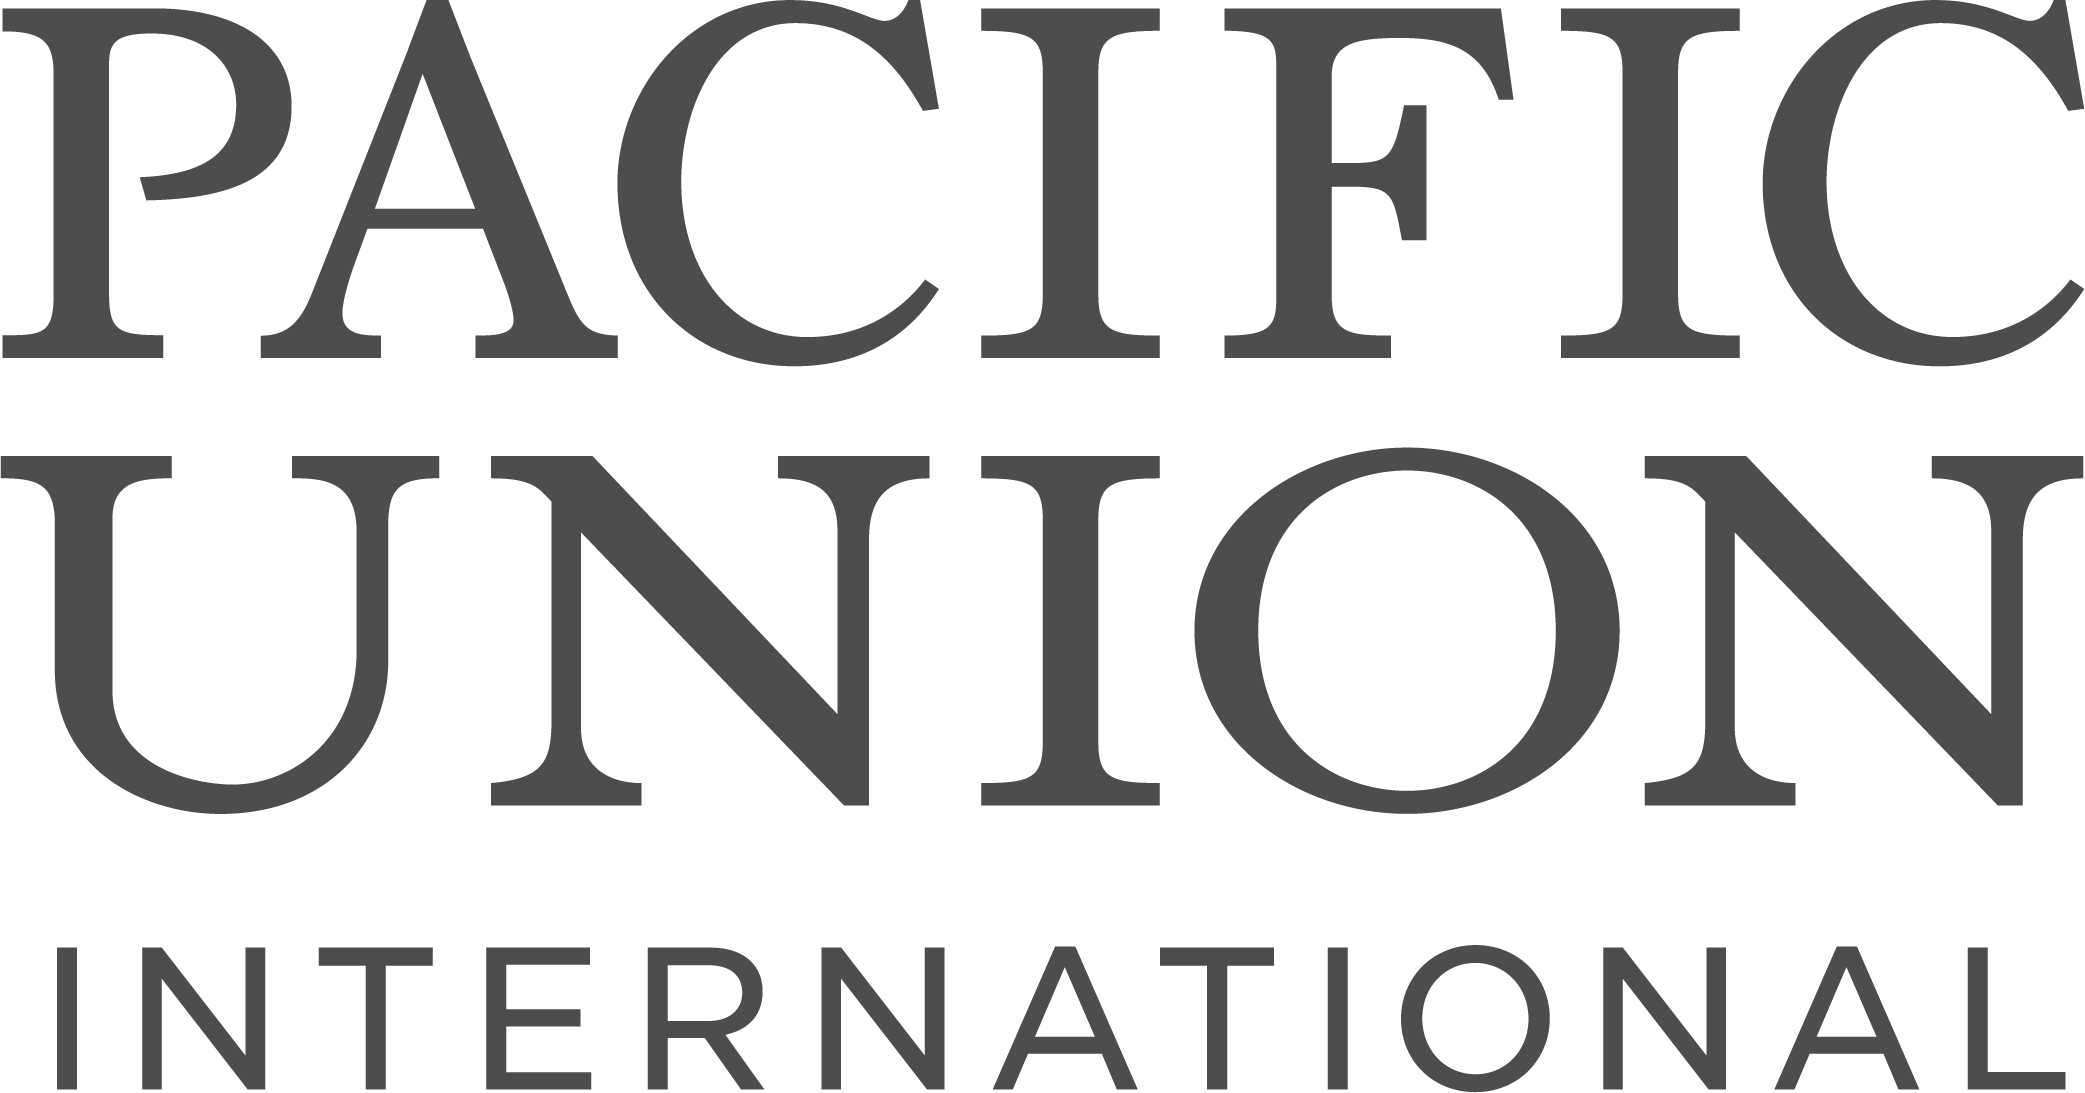 Pacific Union International